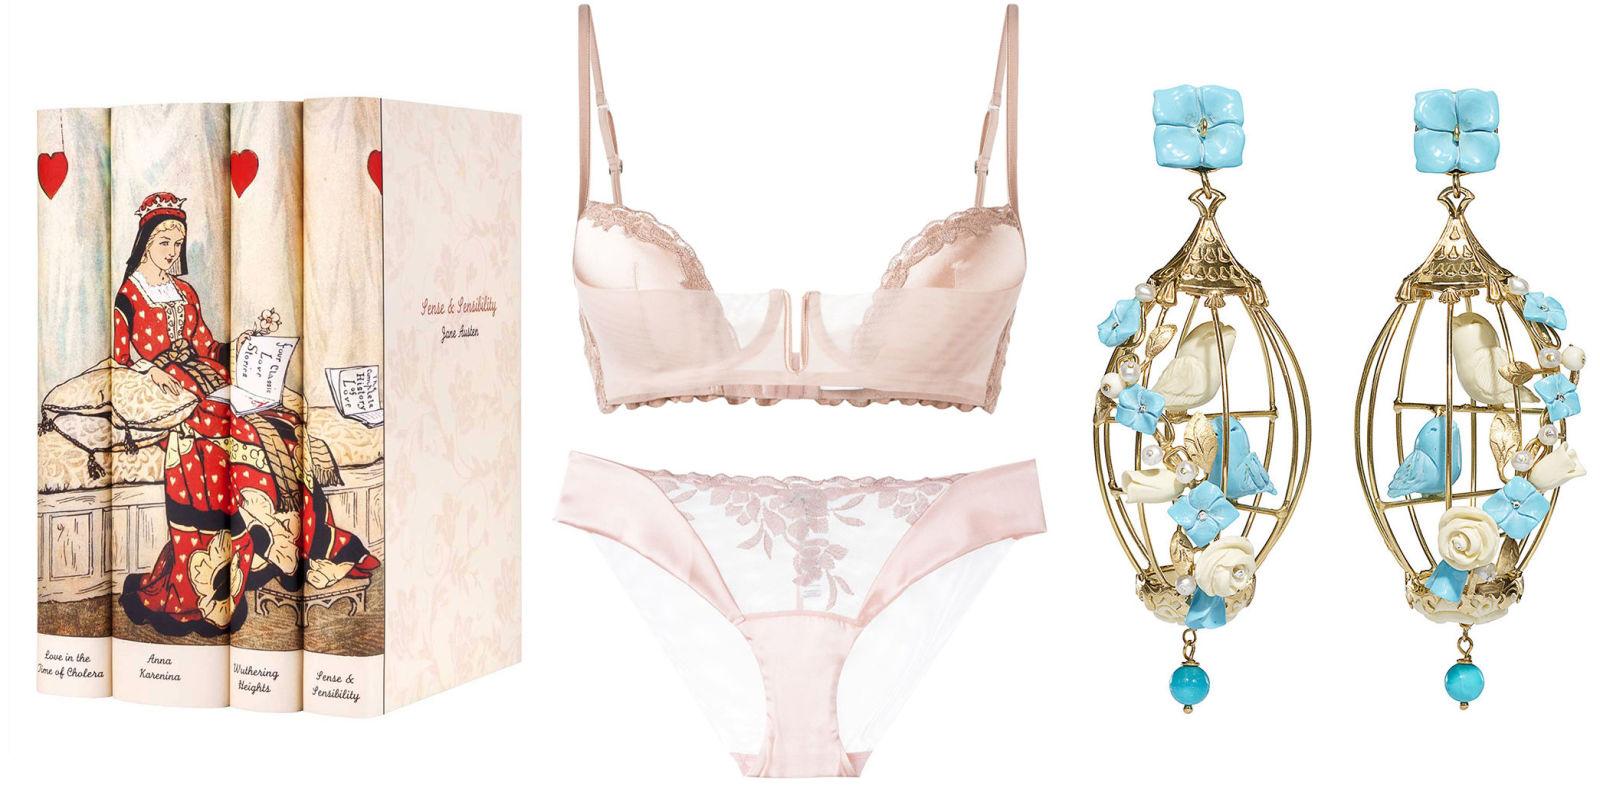 Luxury Wedding Gift Ideas: Chic Bridal Shower Gift Ideas